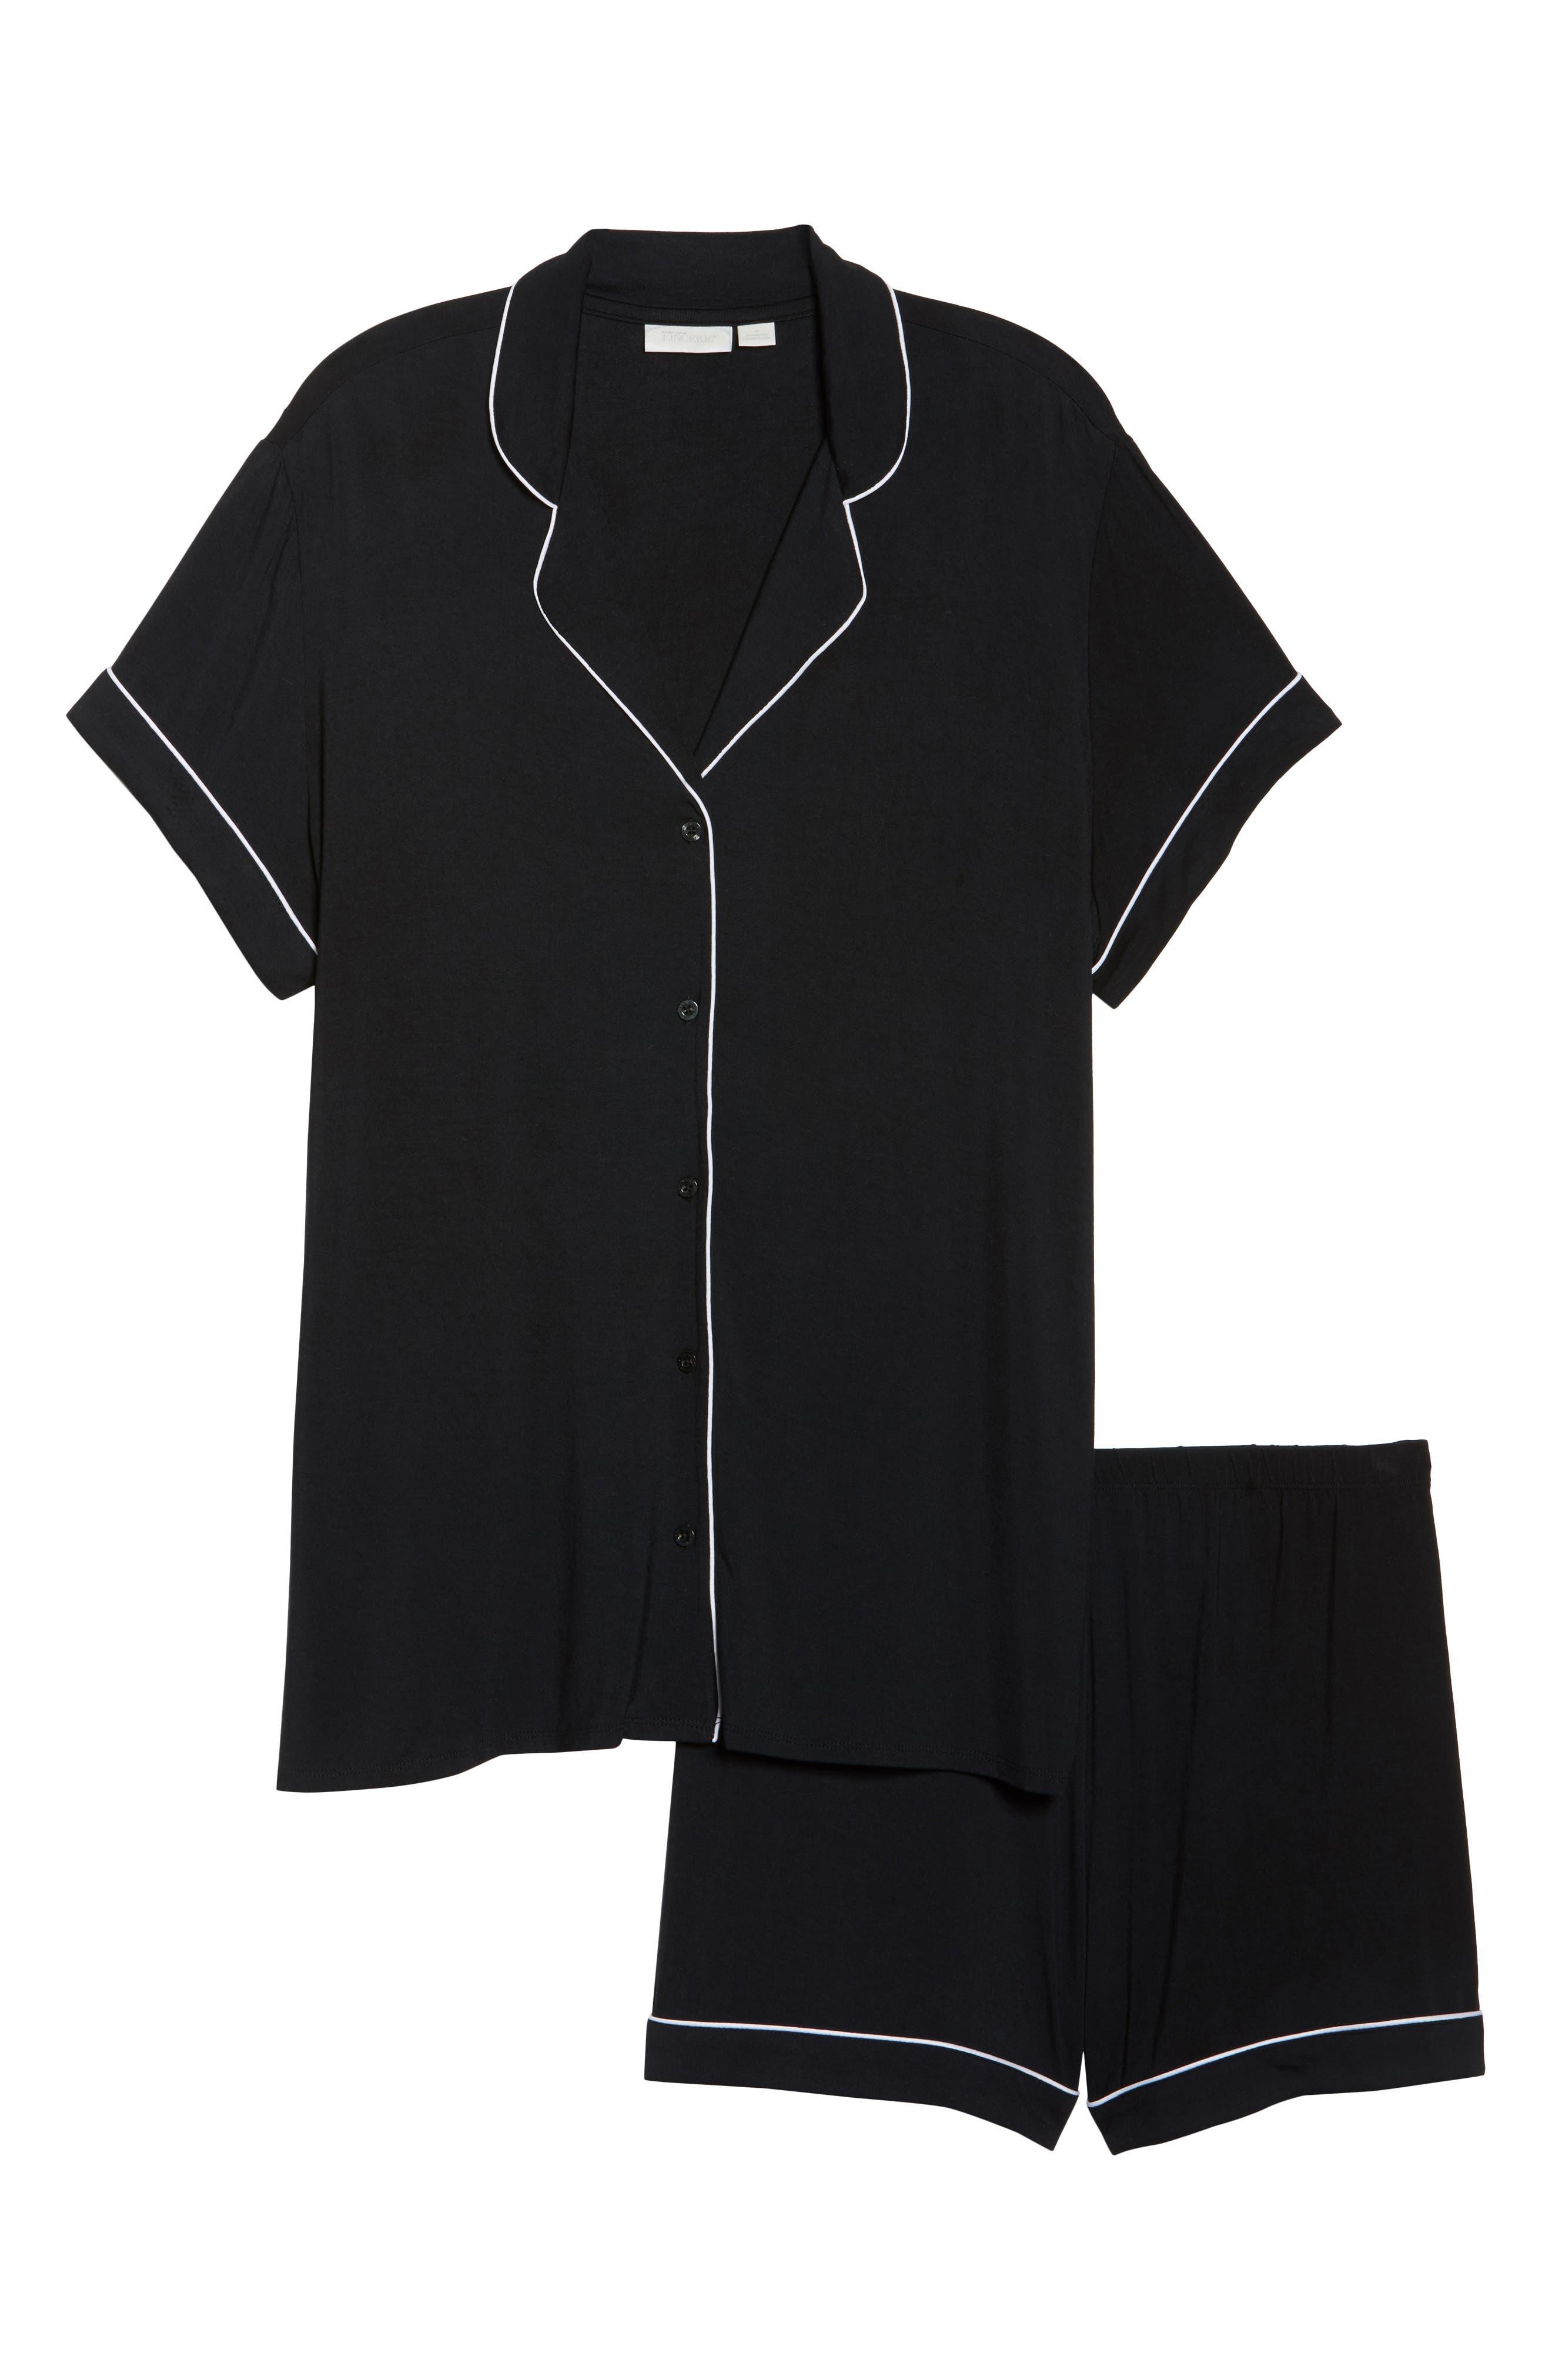 'Moonlight' Short Pajamas,                             Alternate thumbnail 6, color,                             Black